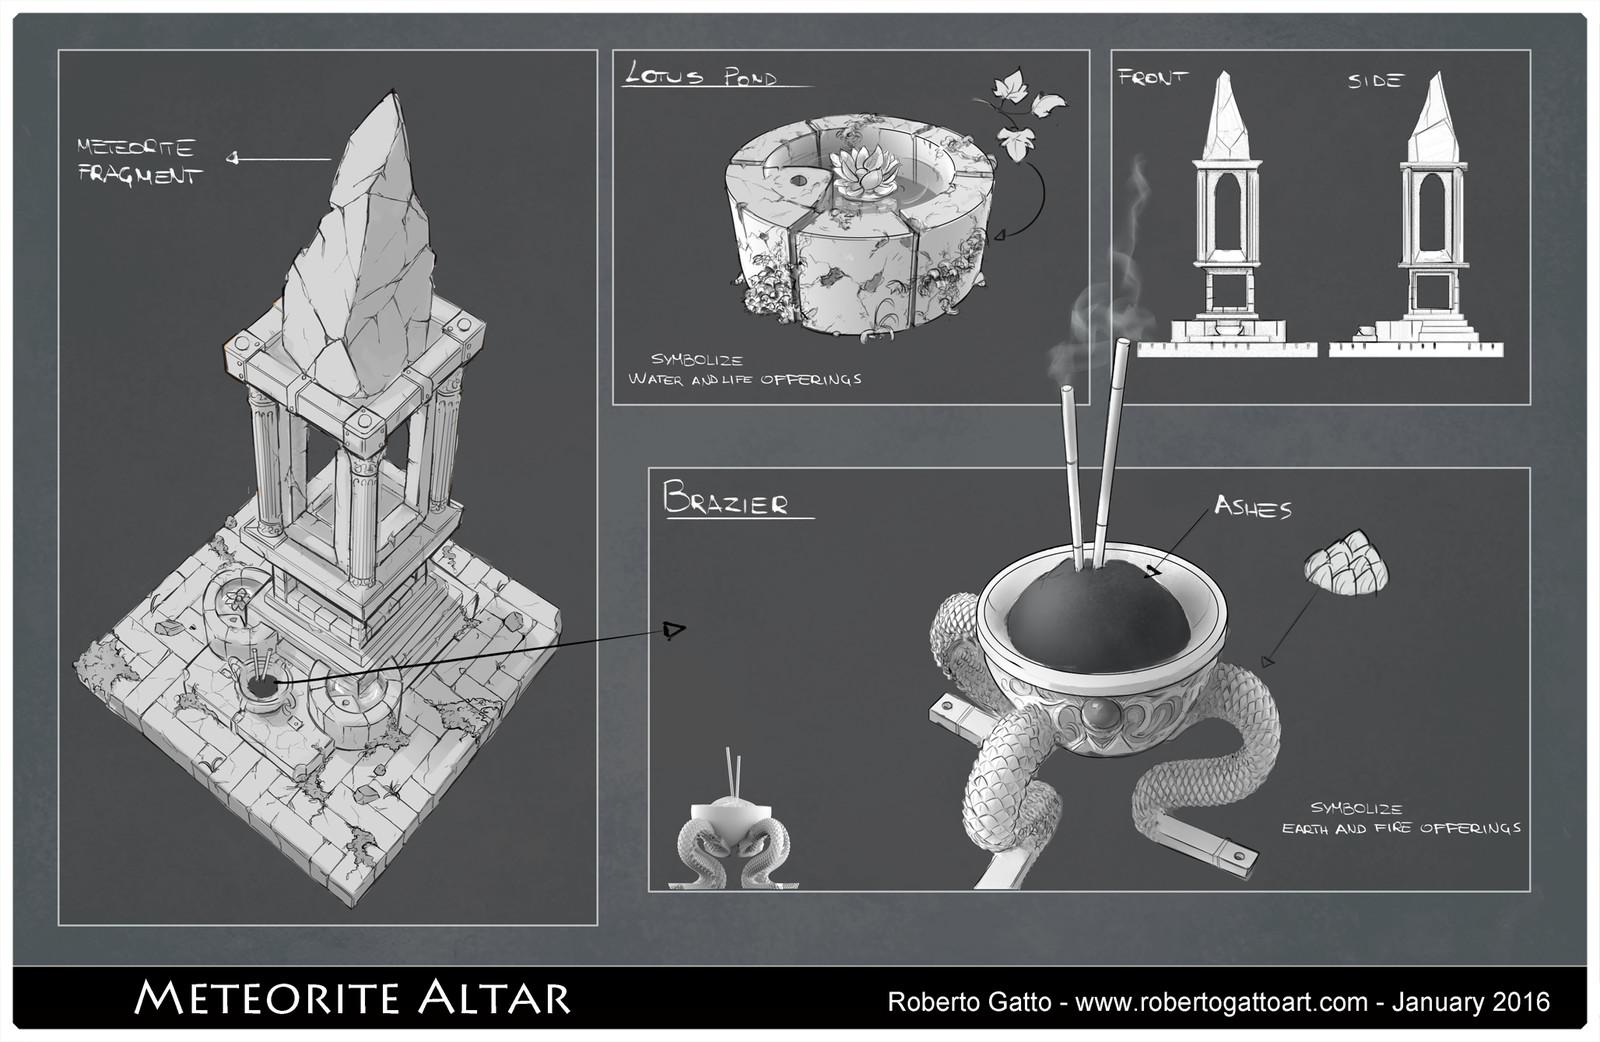 Meteorite altar